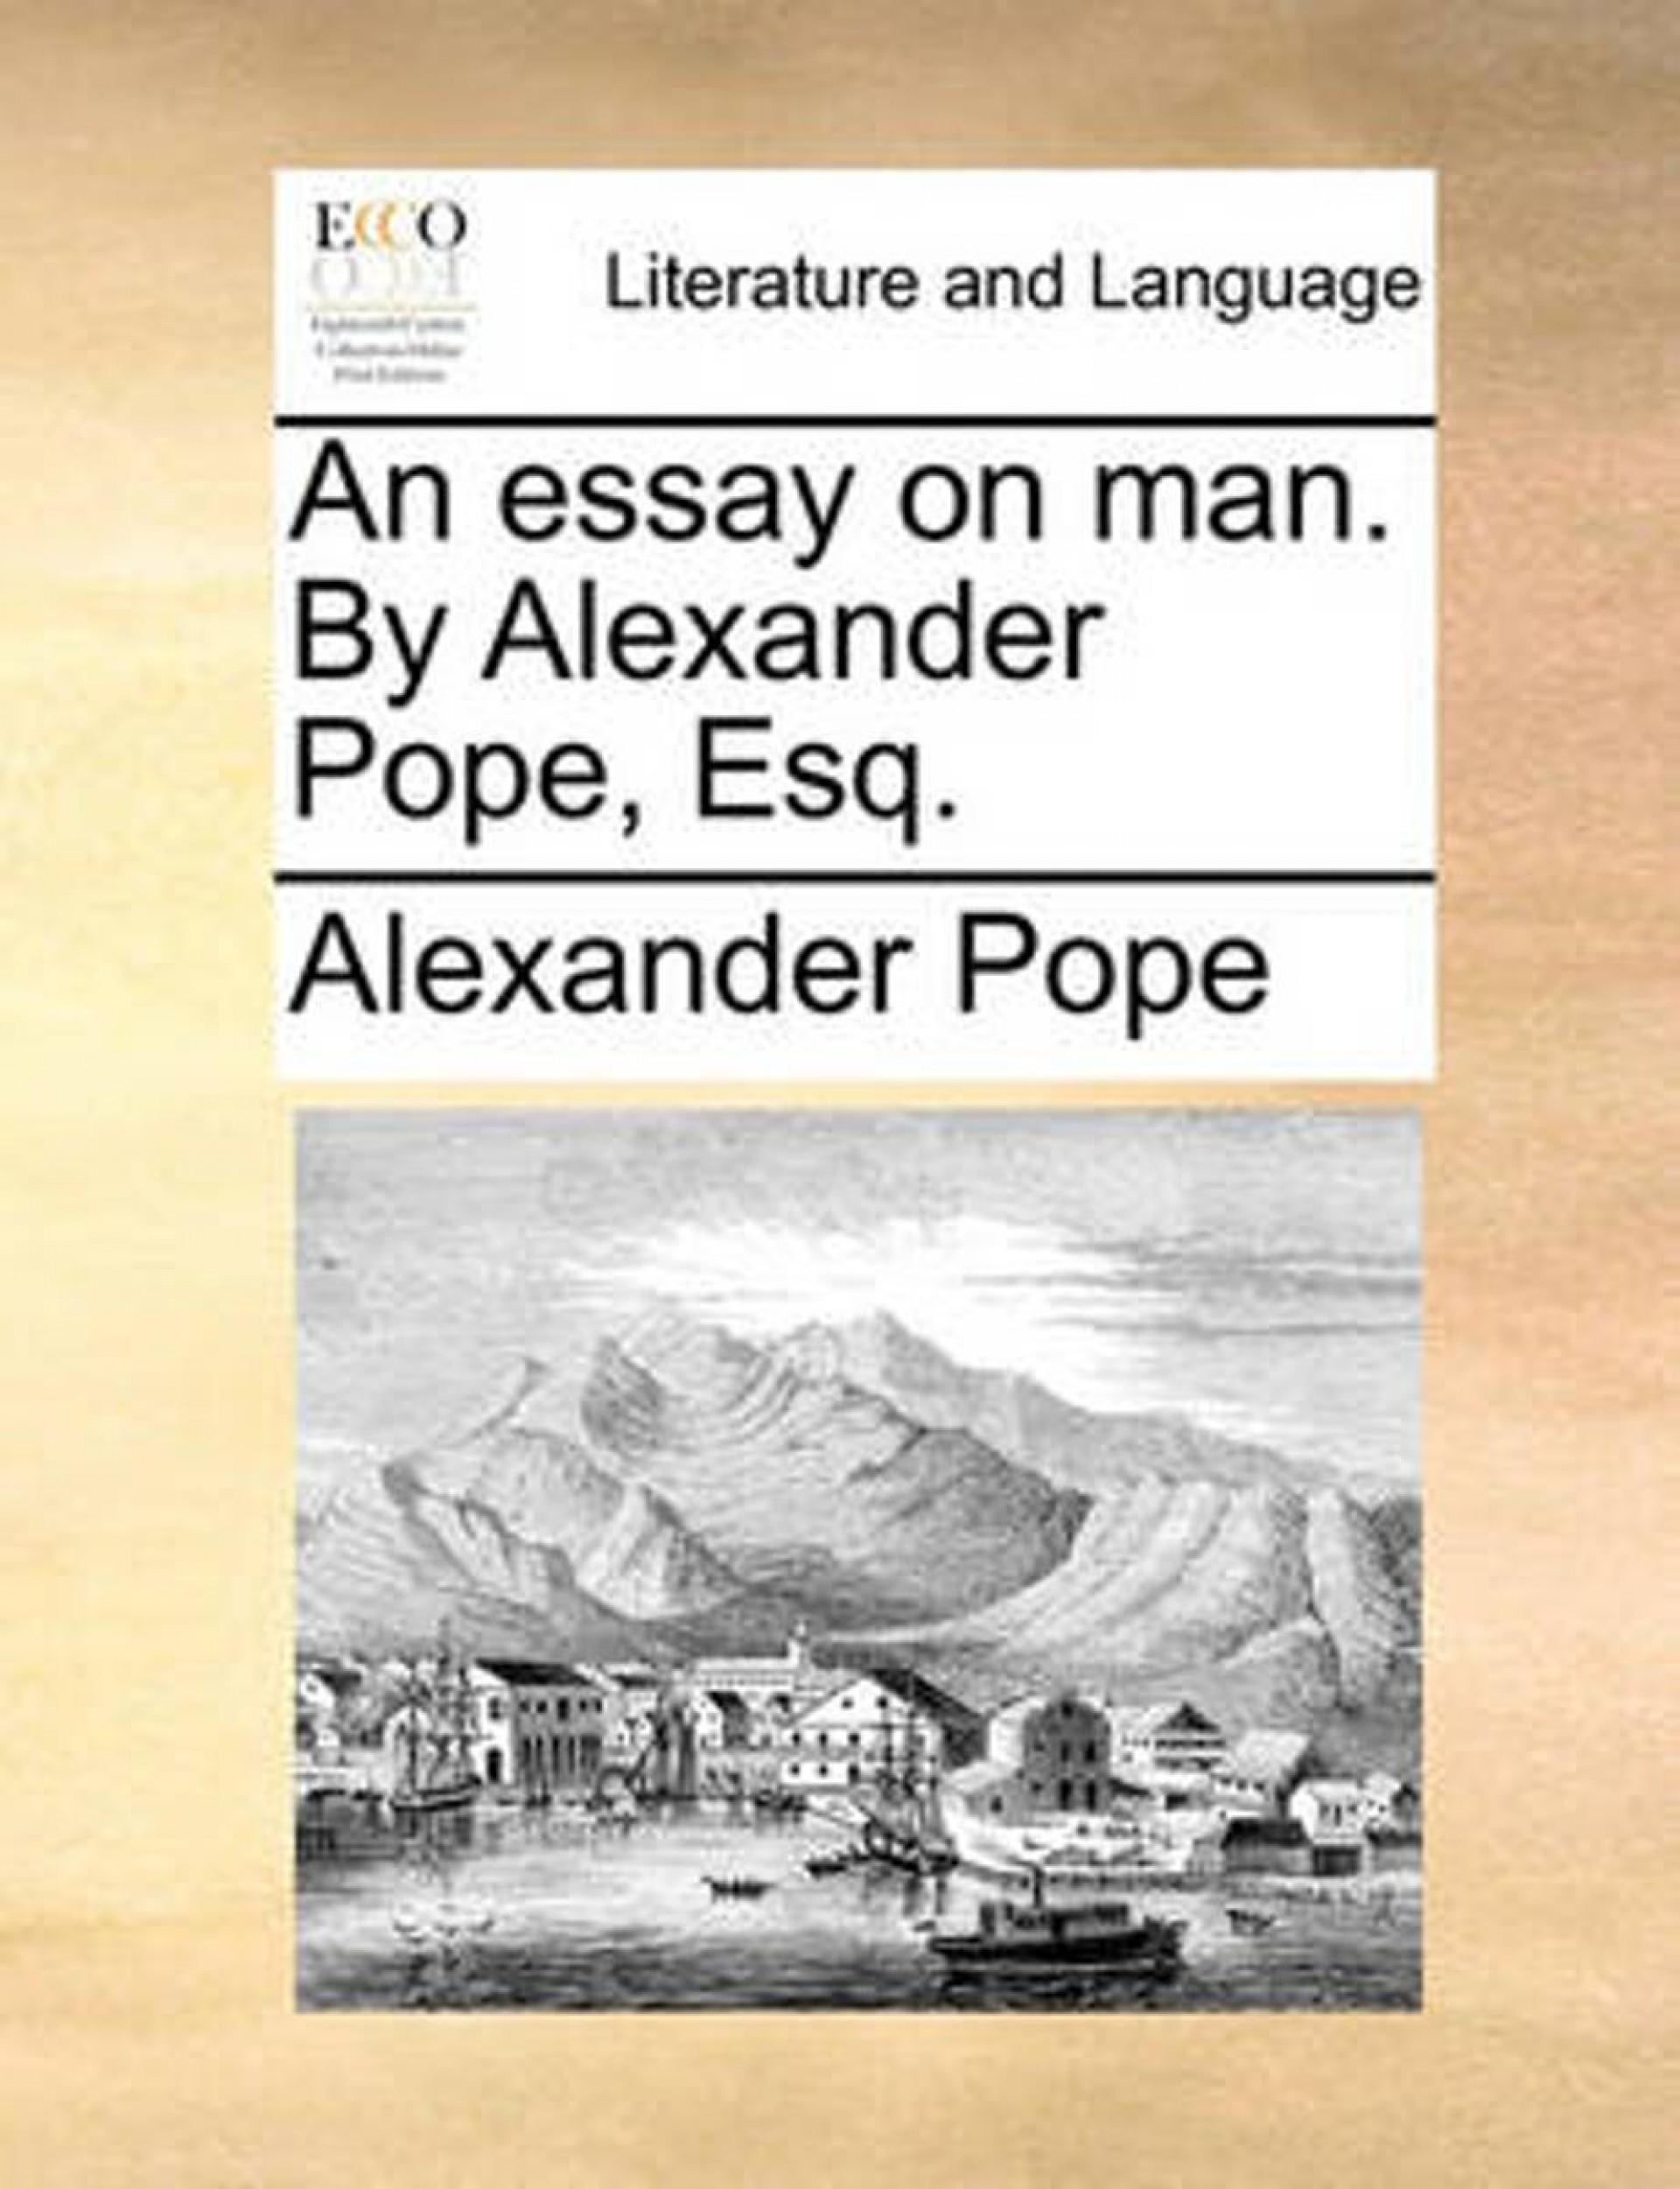 014 Alexander Pope Essay On Man Dreaded Summary Epistle 2 Pdf 1920